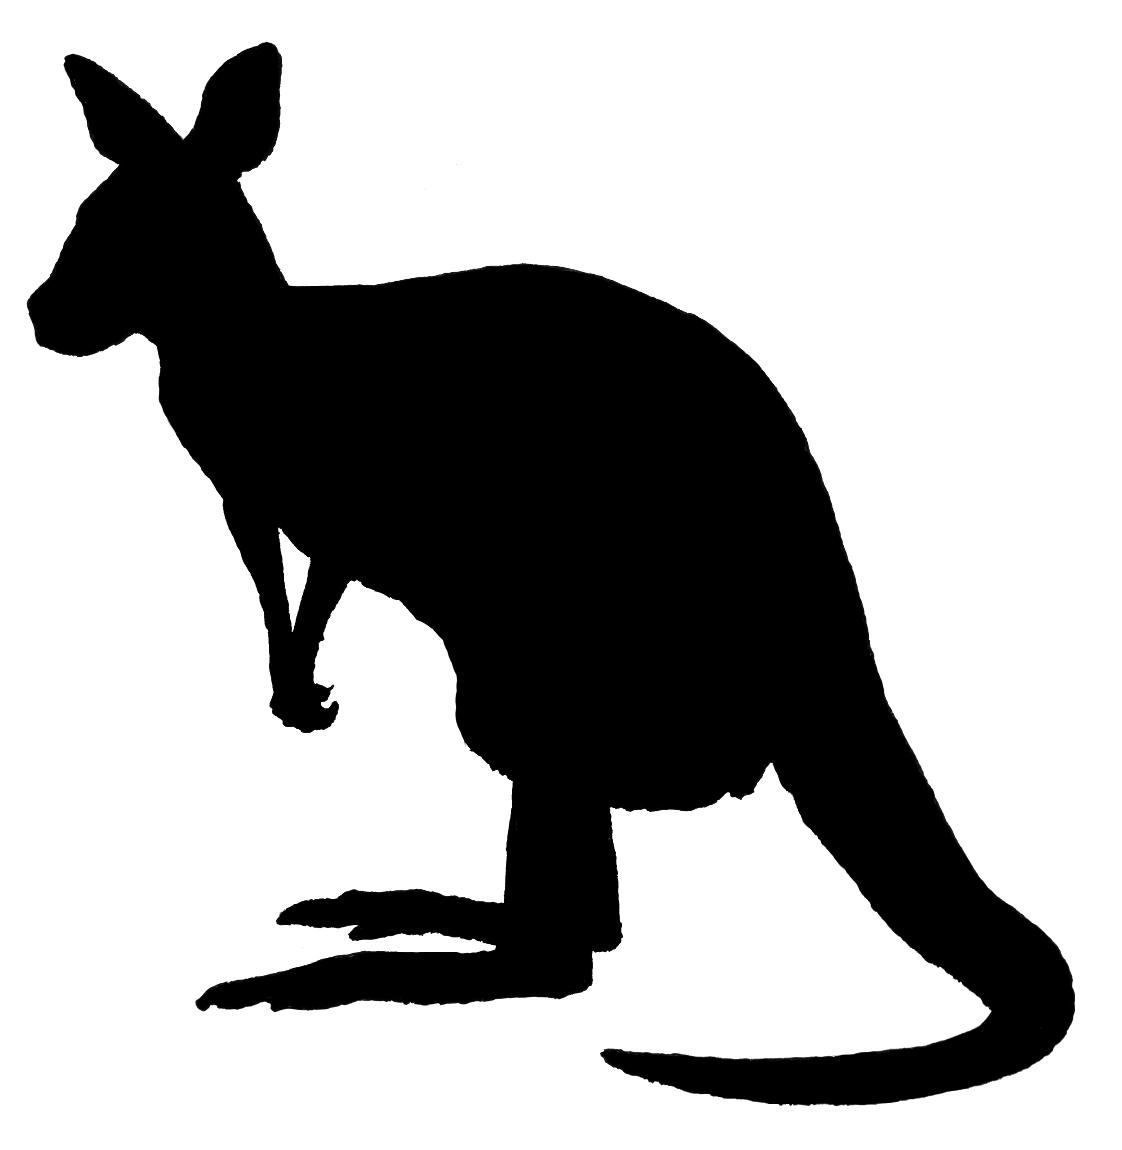 1122x1150 Kangaroo Silhouette Png Image Png Arts